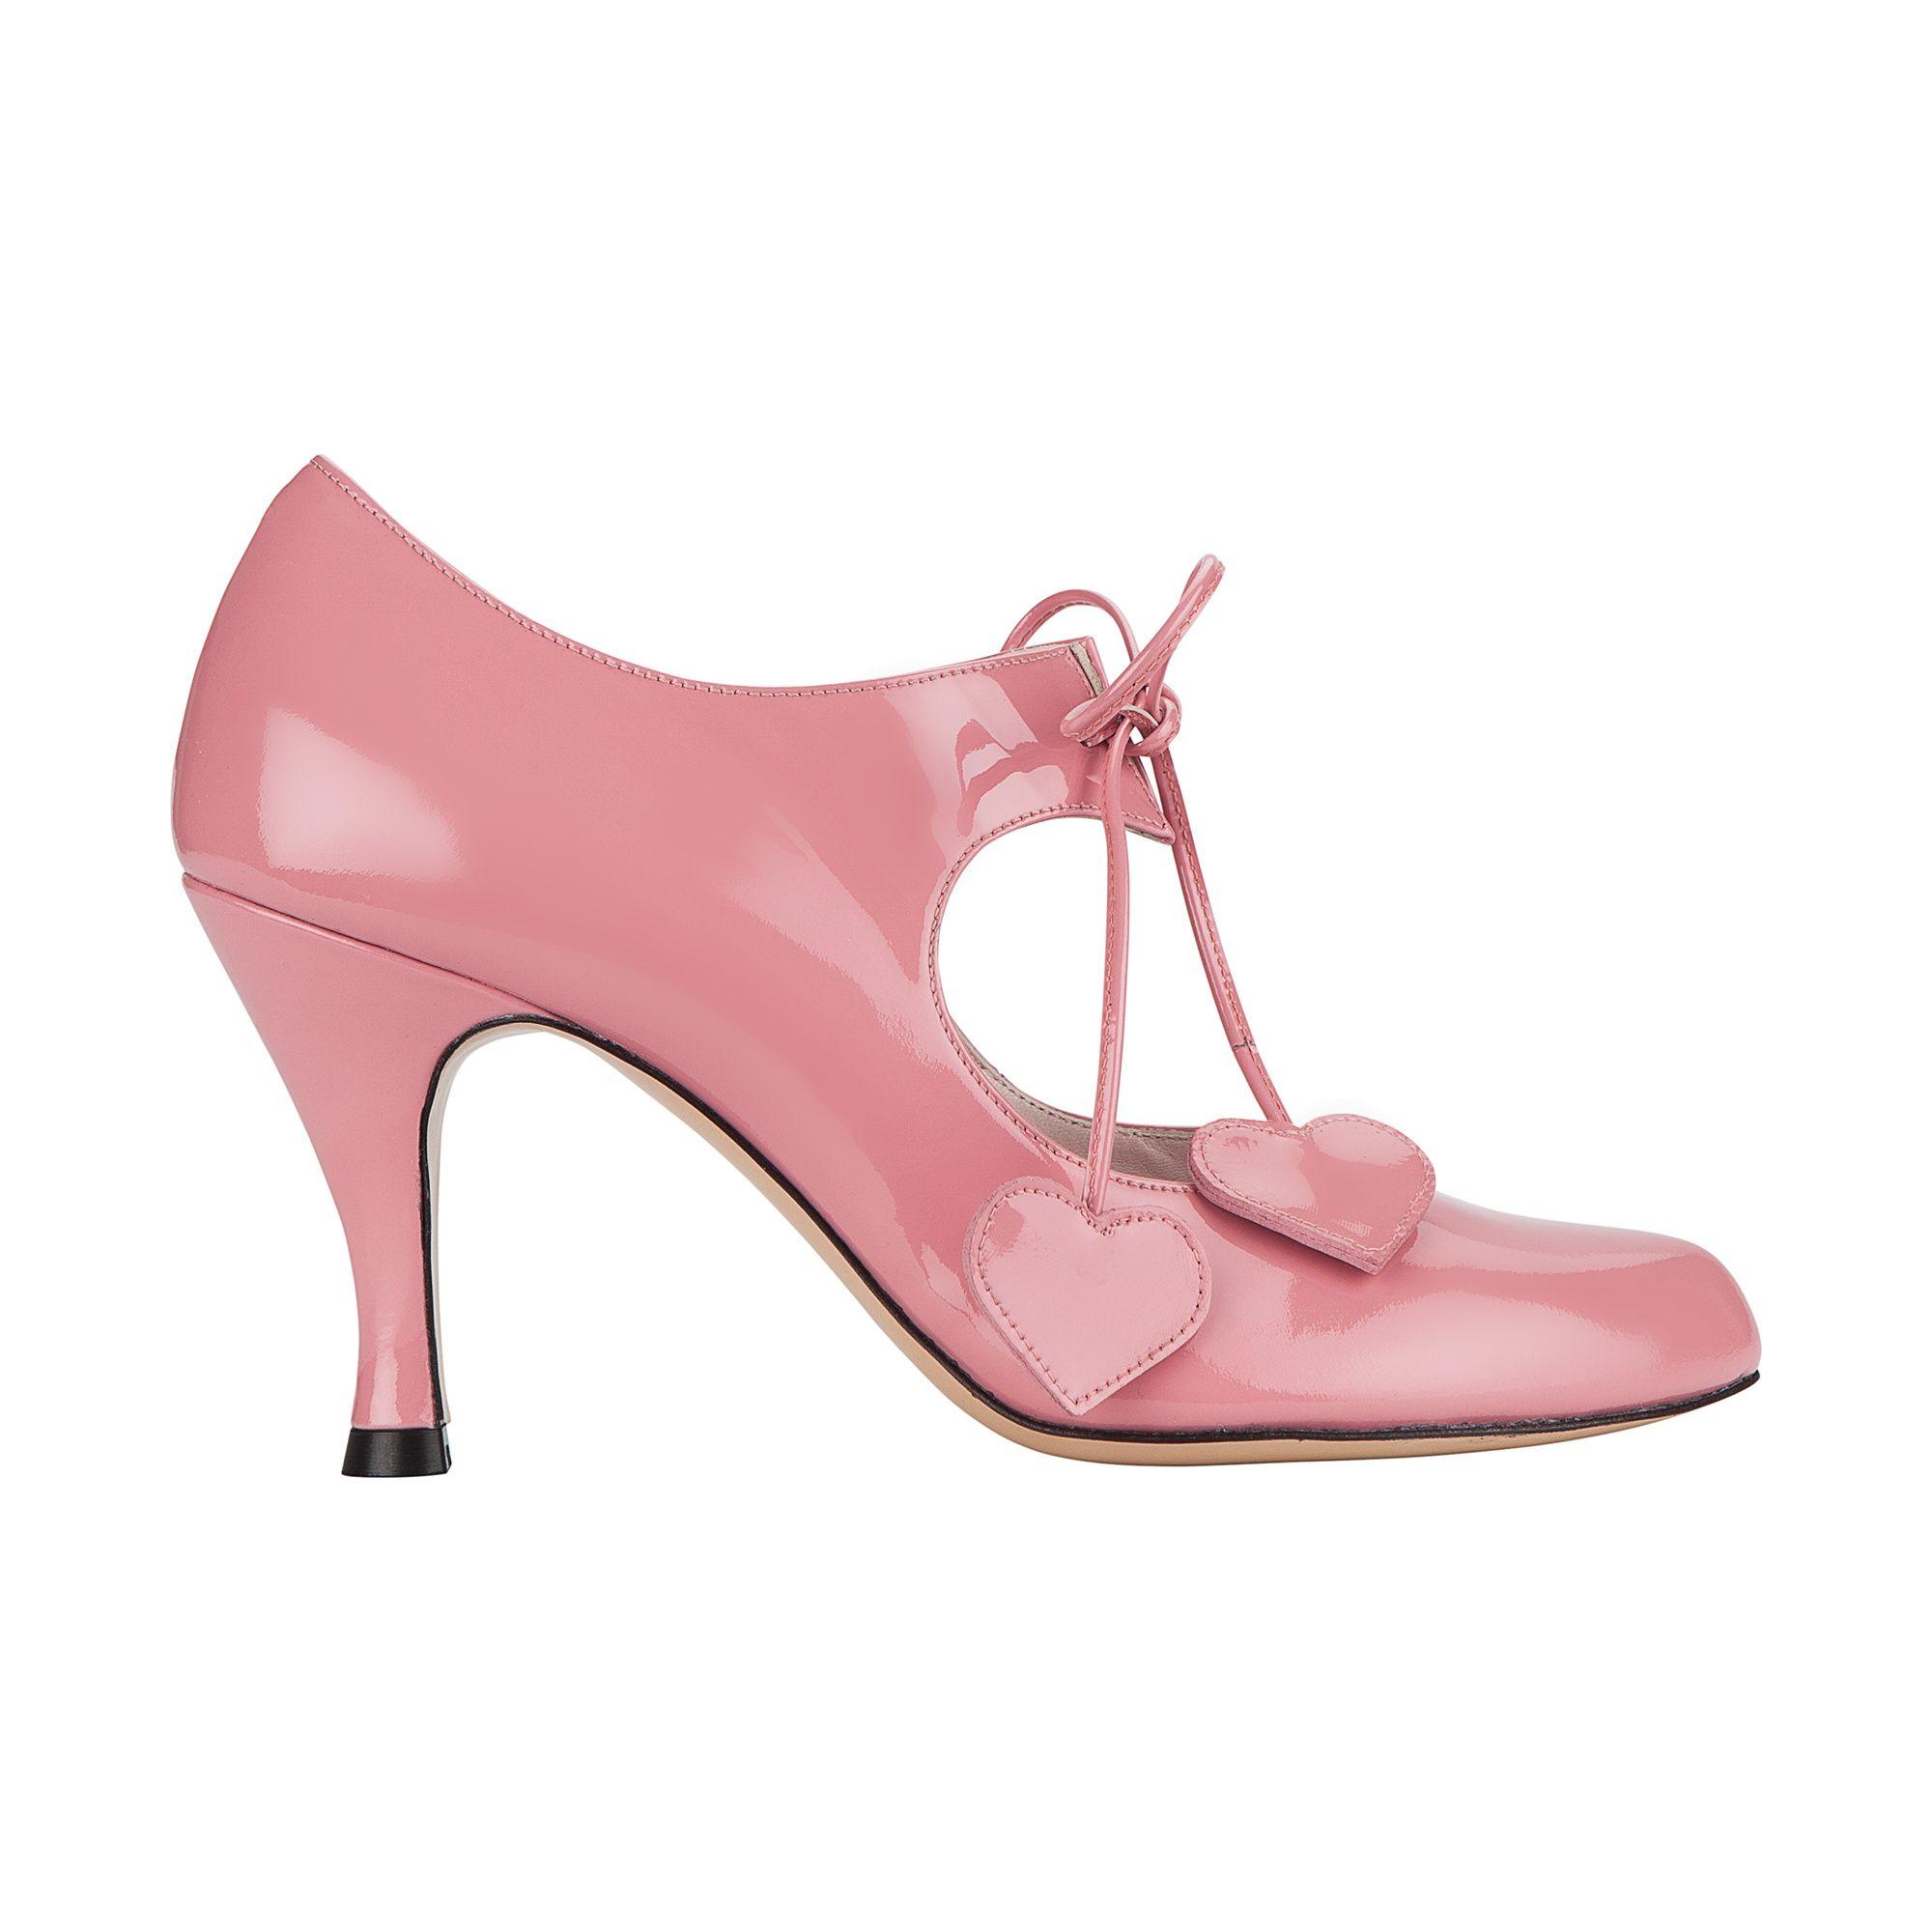 Minna Parikka RAQUEL ROSE PATENT | Korkokenkiä ☆ High heels